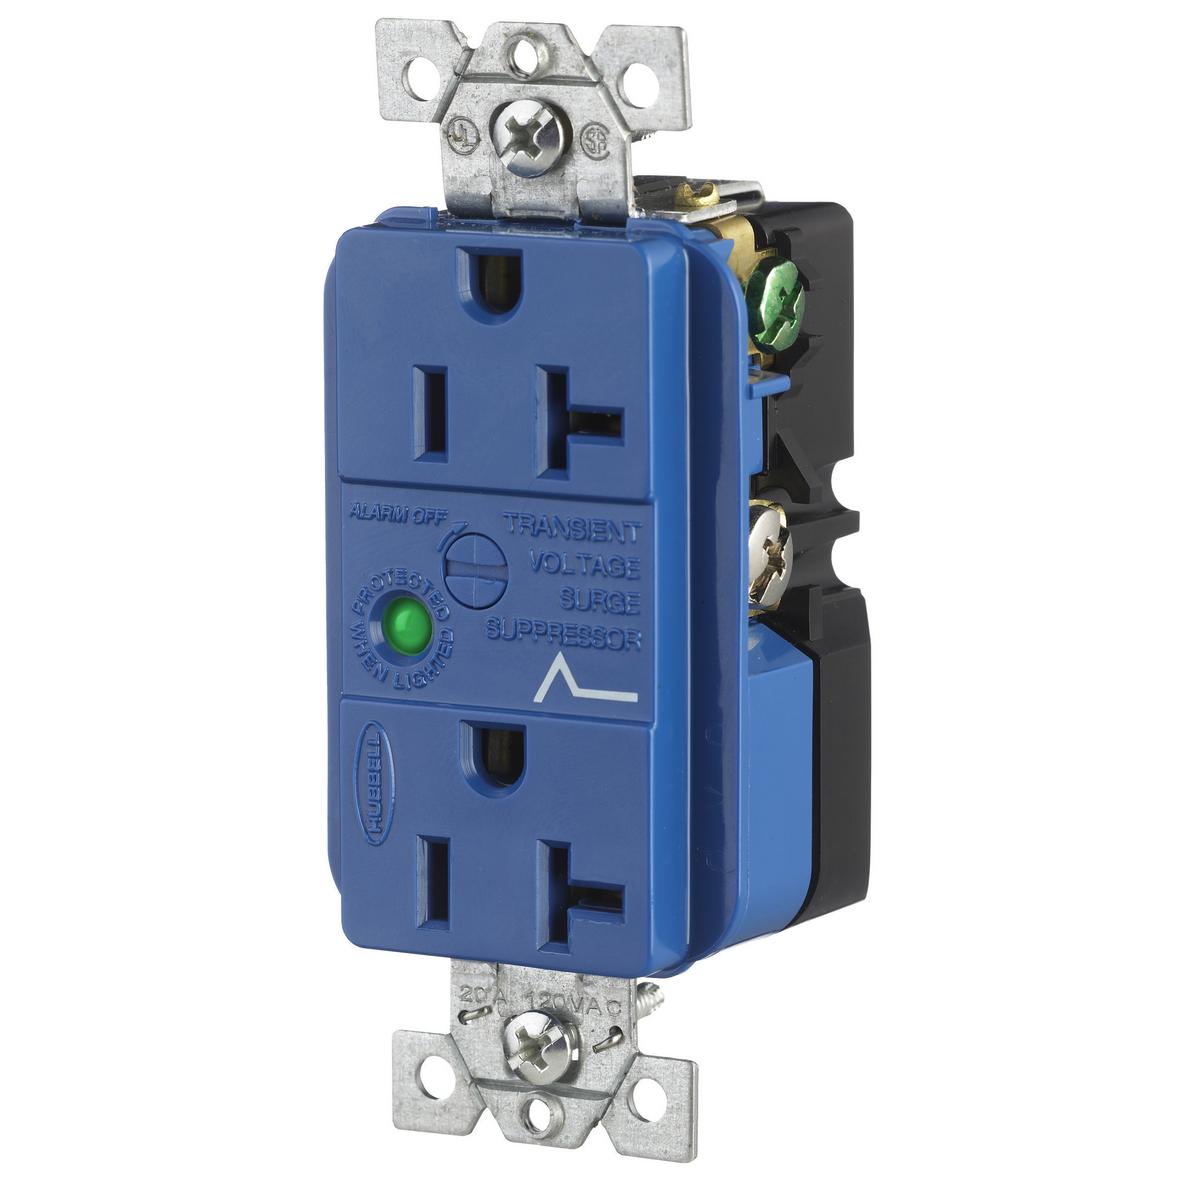 Hubbell HBL5362SA 20 Amp 125 Volt 2-Pole 3-Wire NEMA 5-20R Blue Duplex Surge Suppression Receptacle